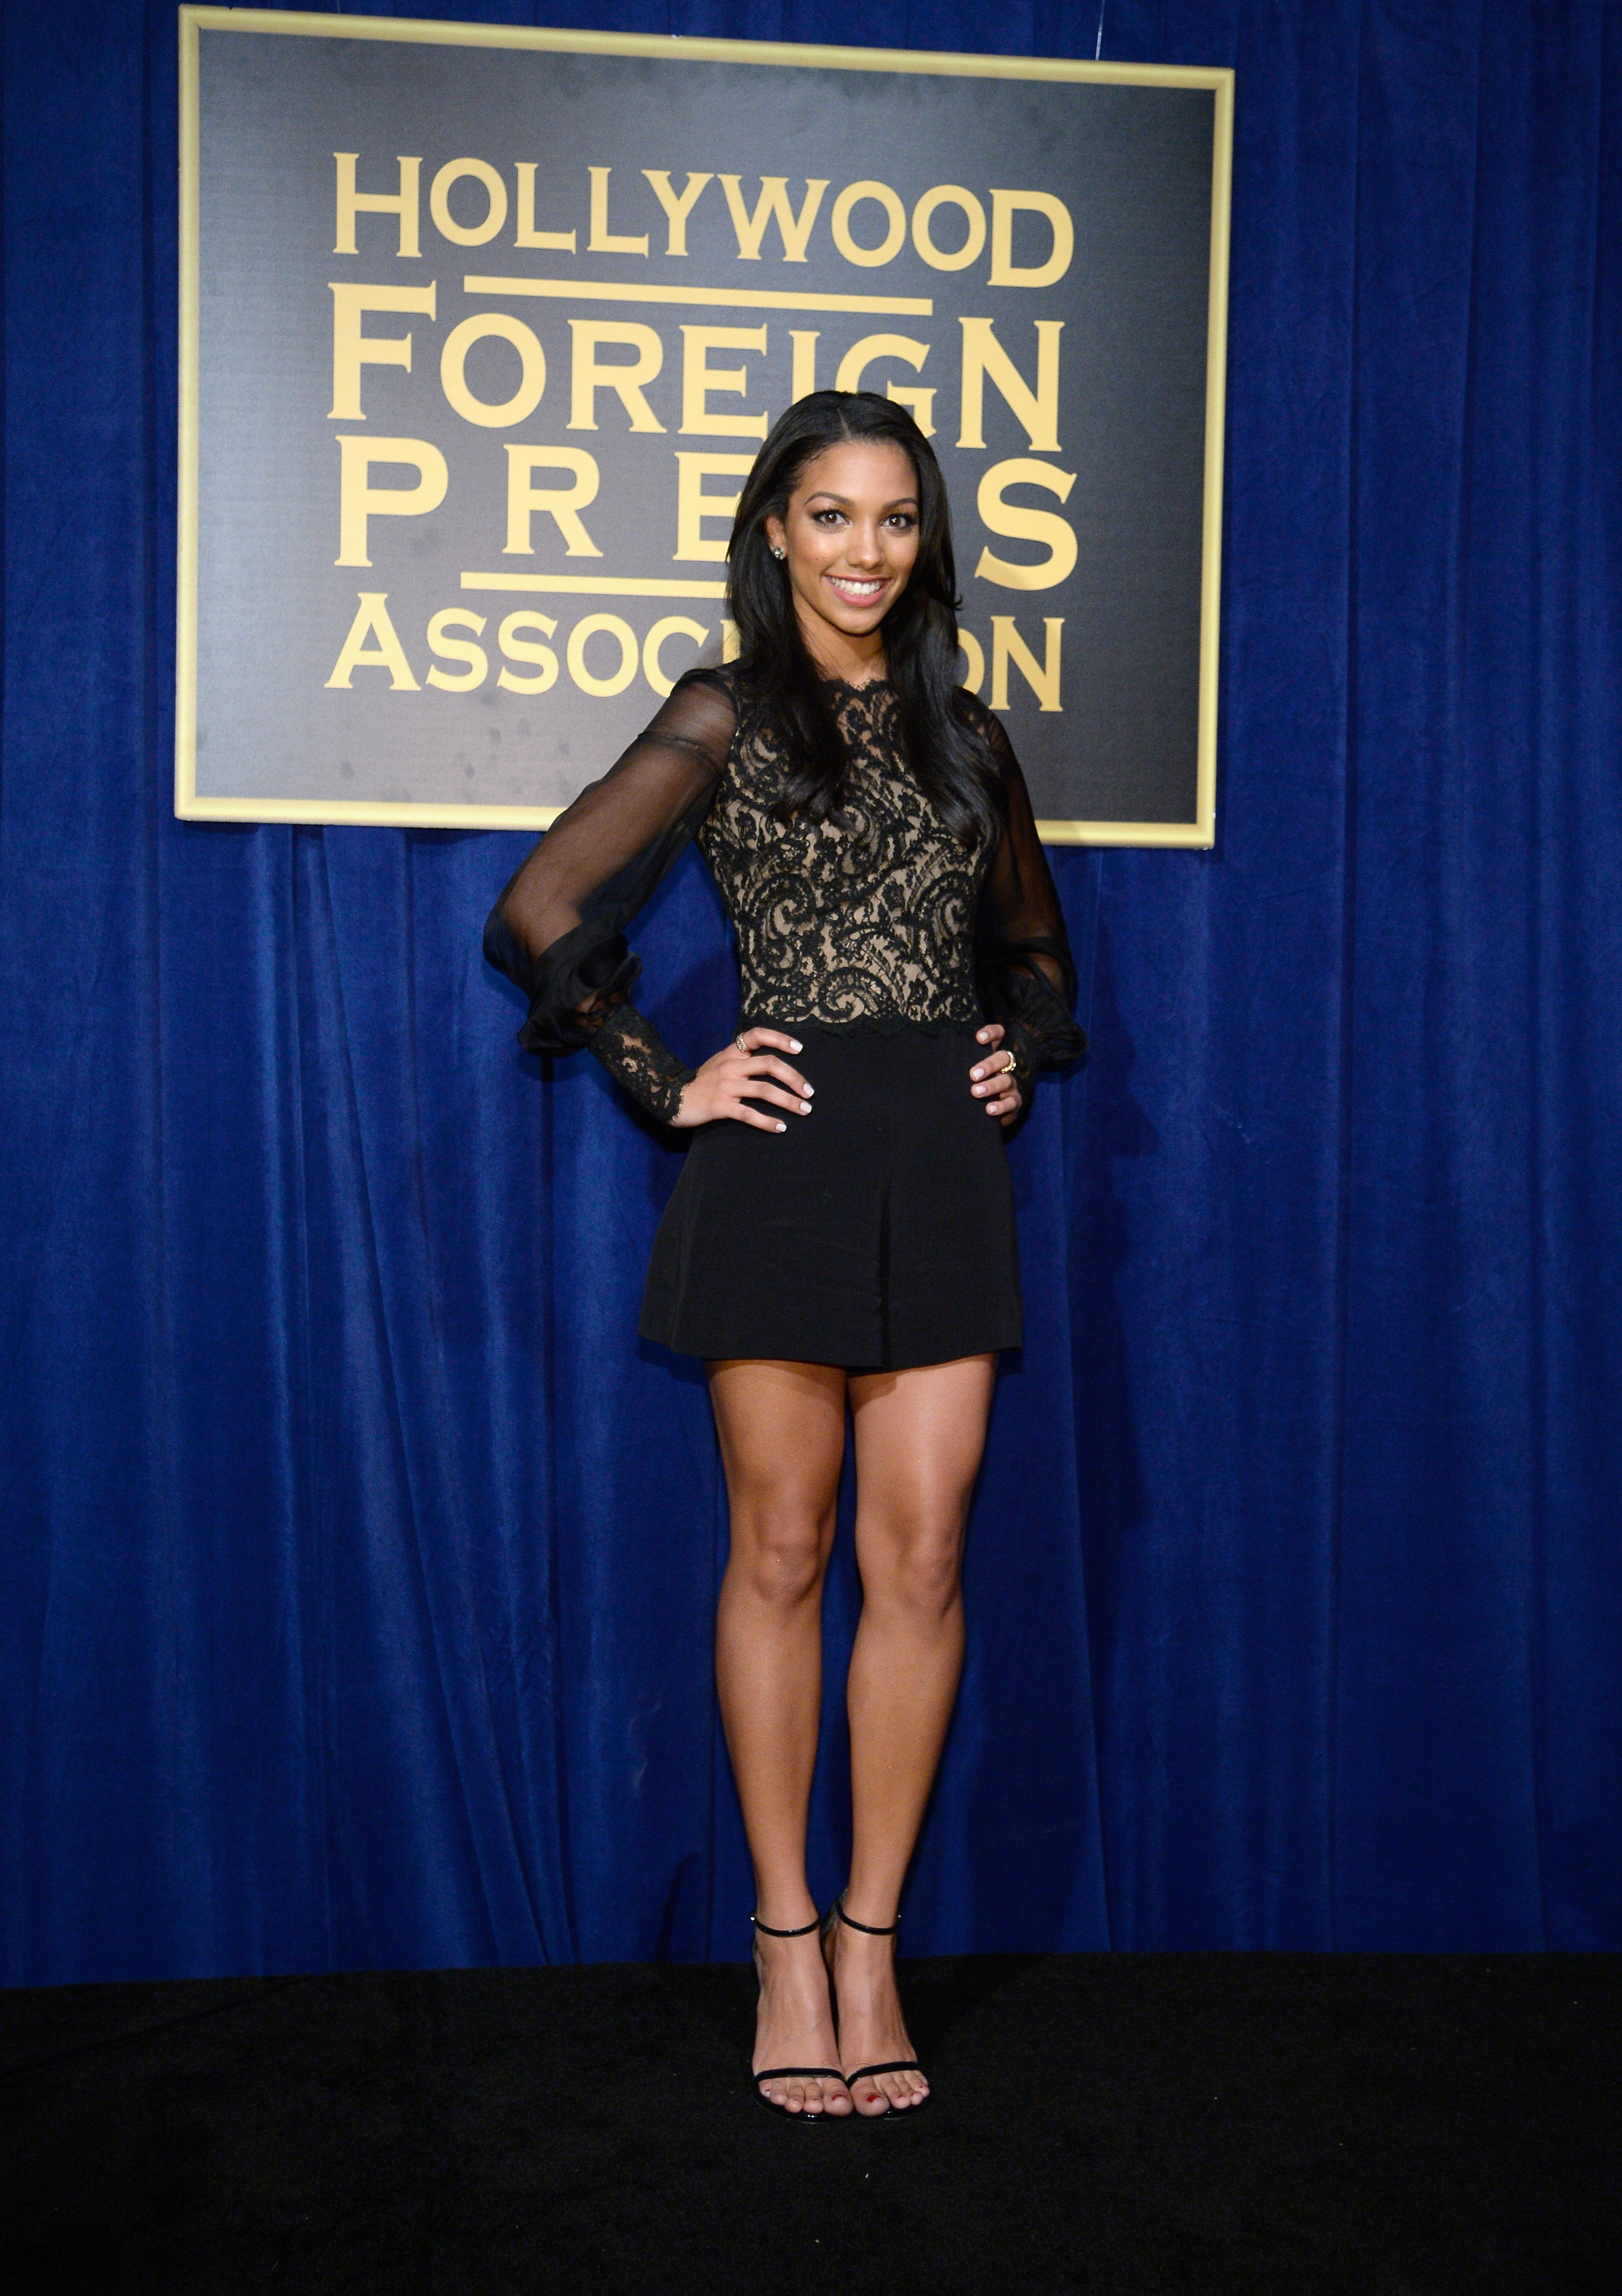 Corinne-Foxx-Named-Miss-Golden-Globe-2016